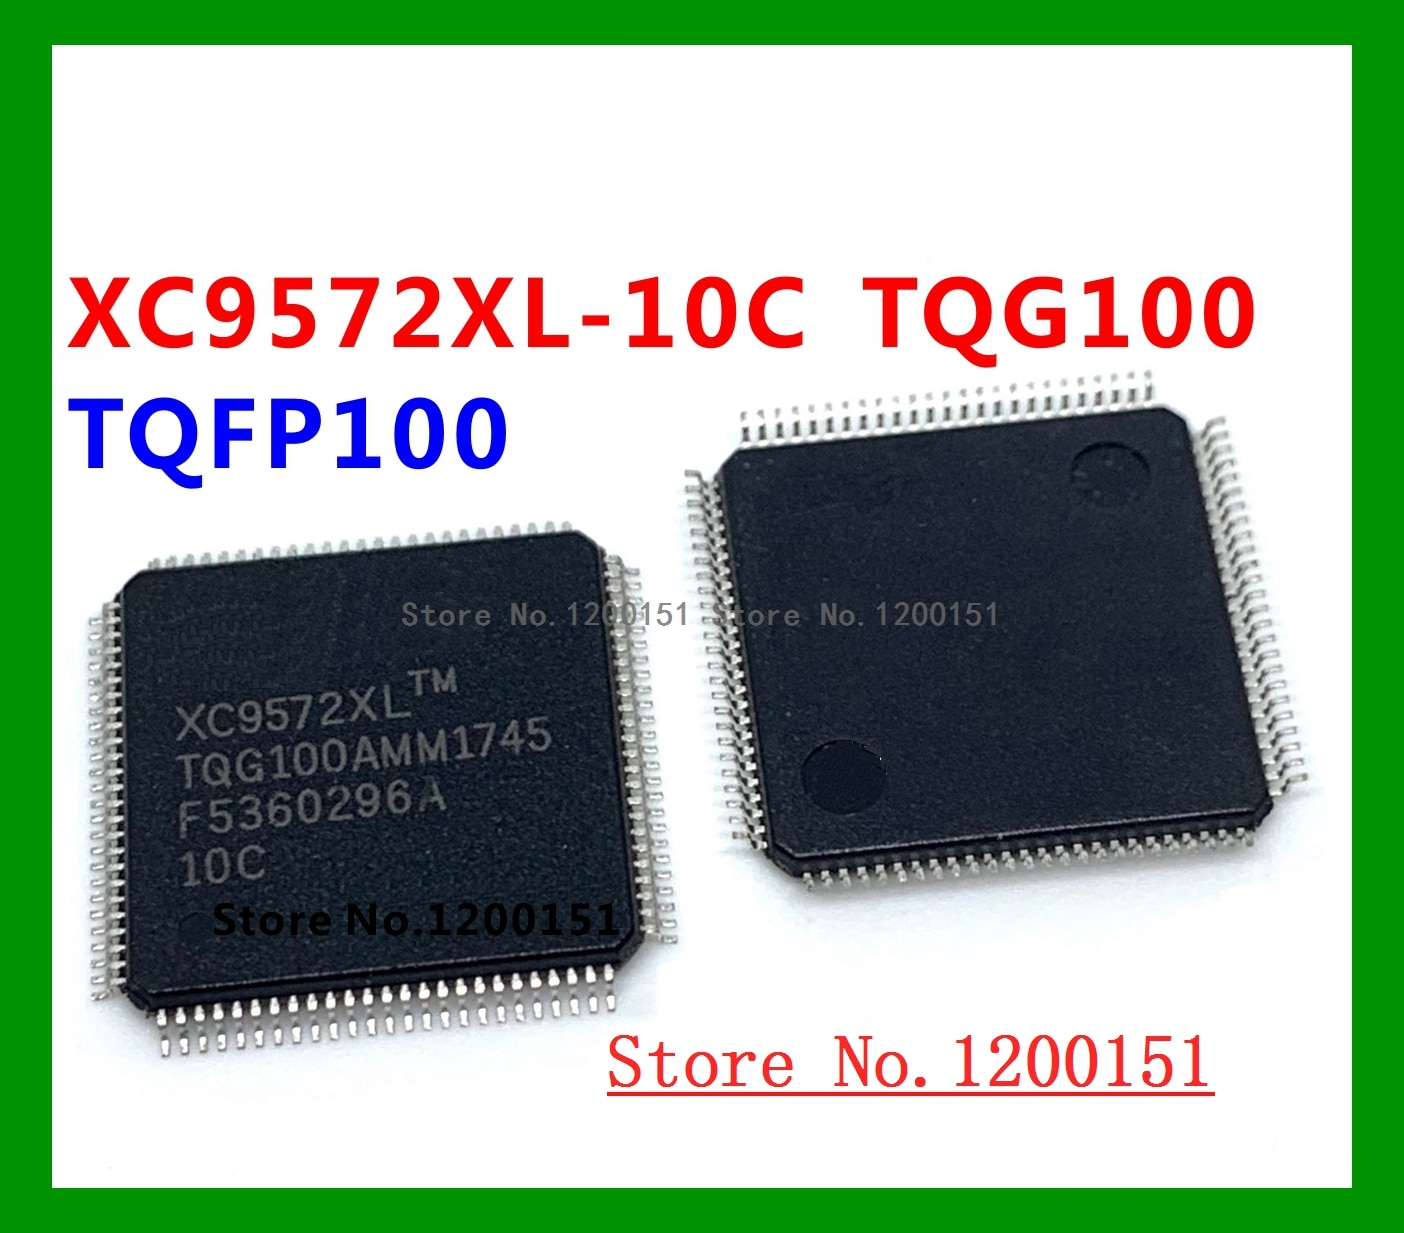 XC9572XL-10C TQG100 XC9572 PQ100 XC9572-15PC PQ100 XC9572XL-10C VQG44 XC9572-10C PC44 XC9572 PCG84 XC9572-10C PCG84